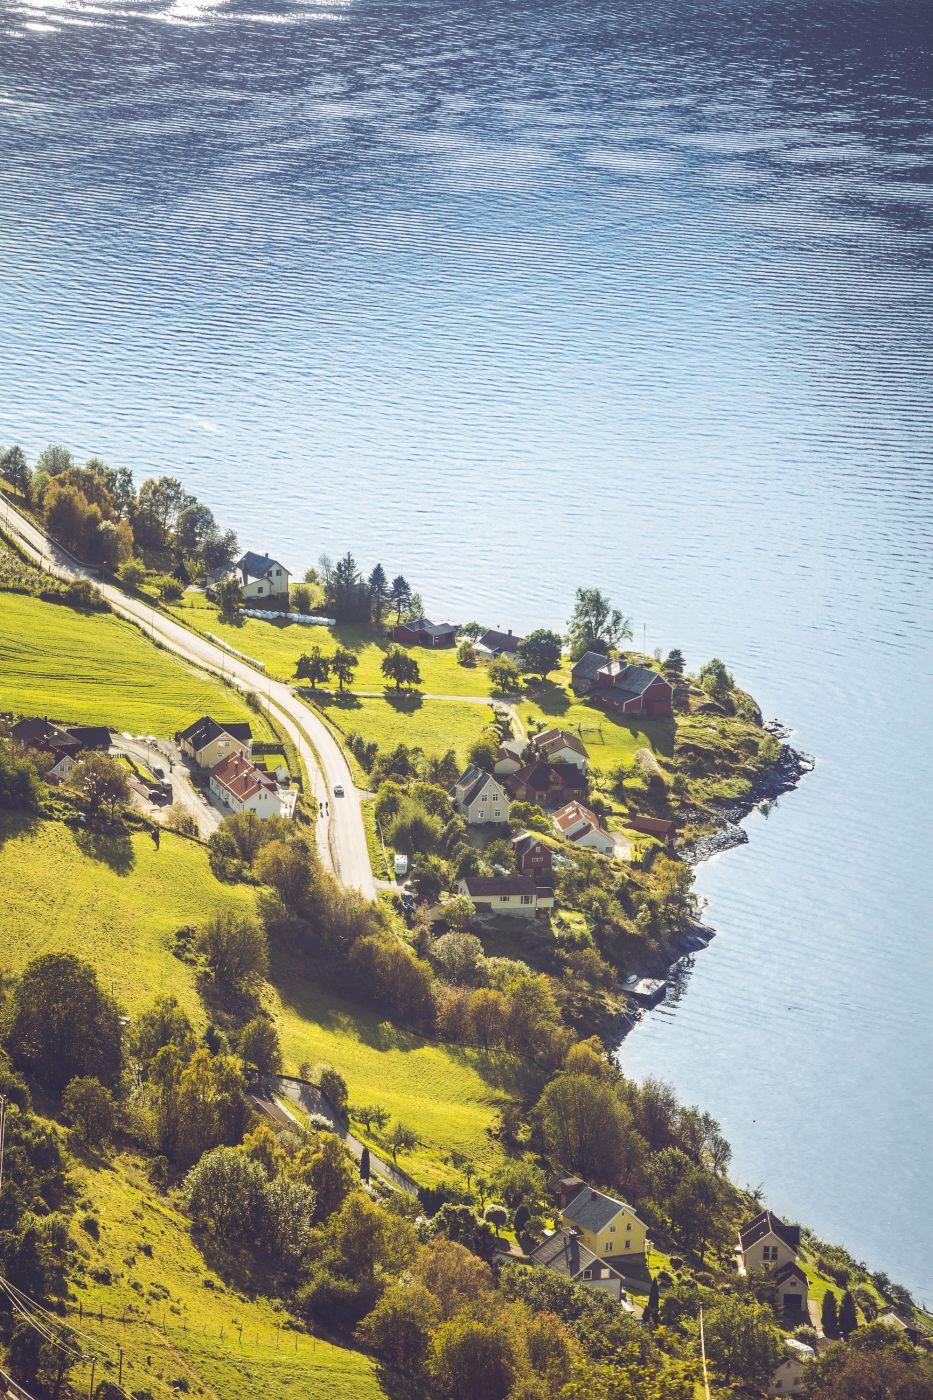 Aulandsfjord, Norway